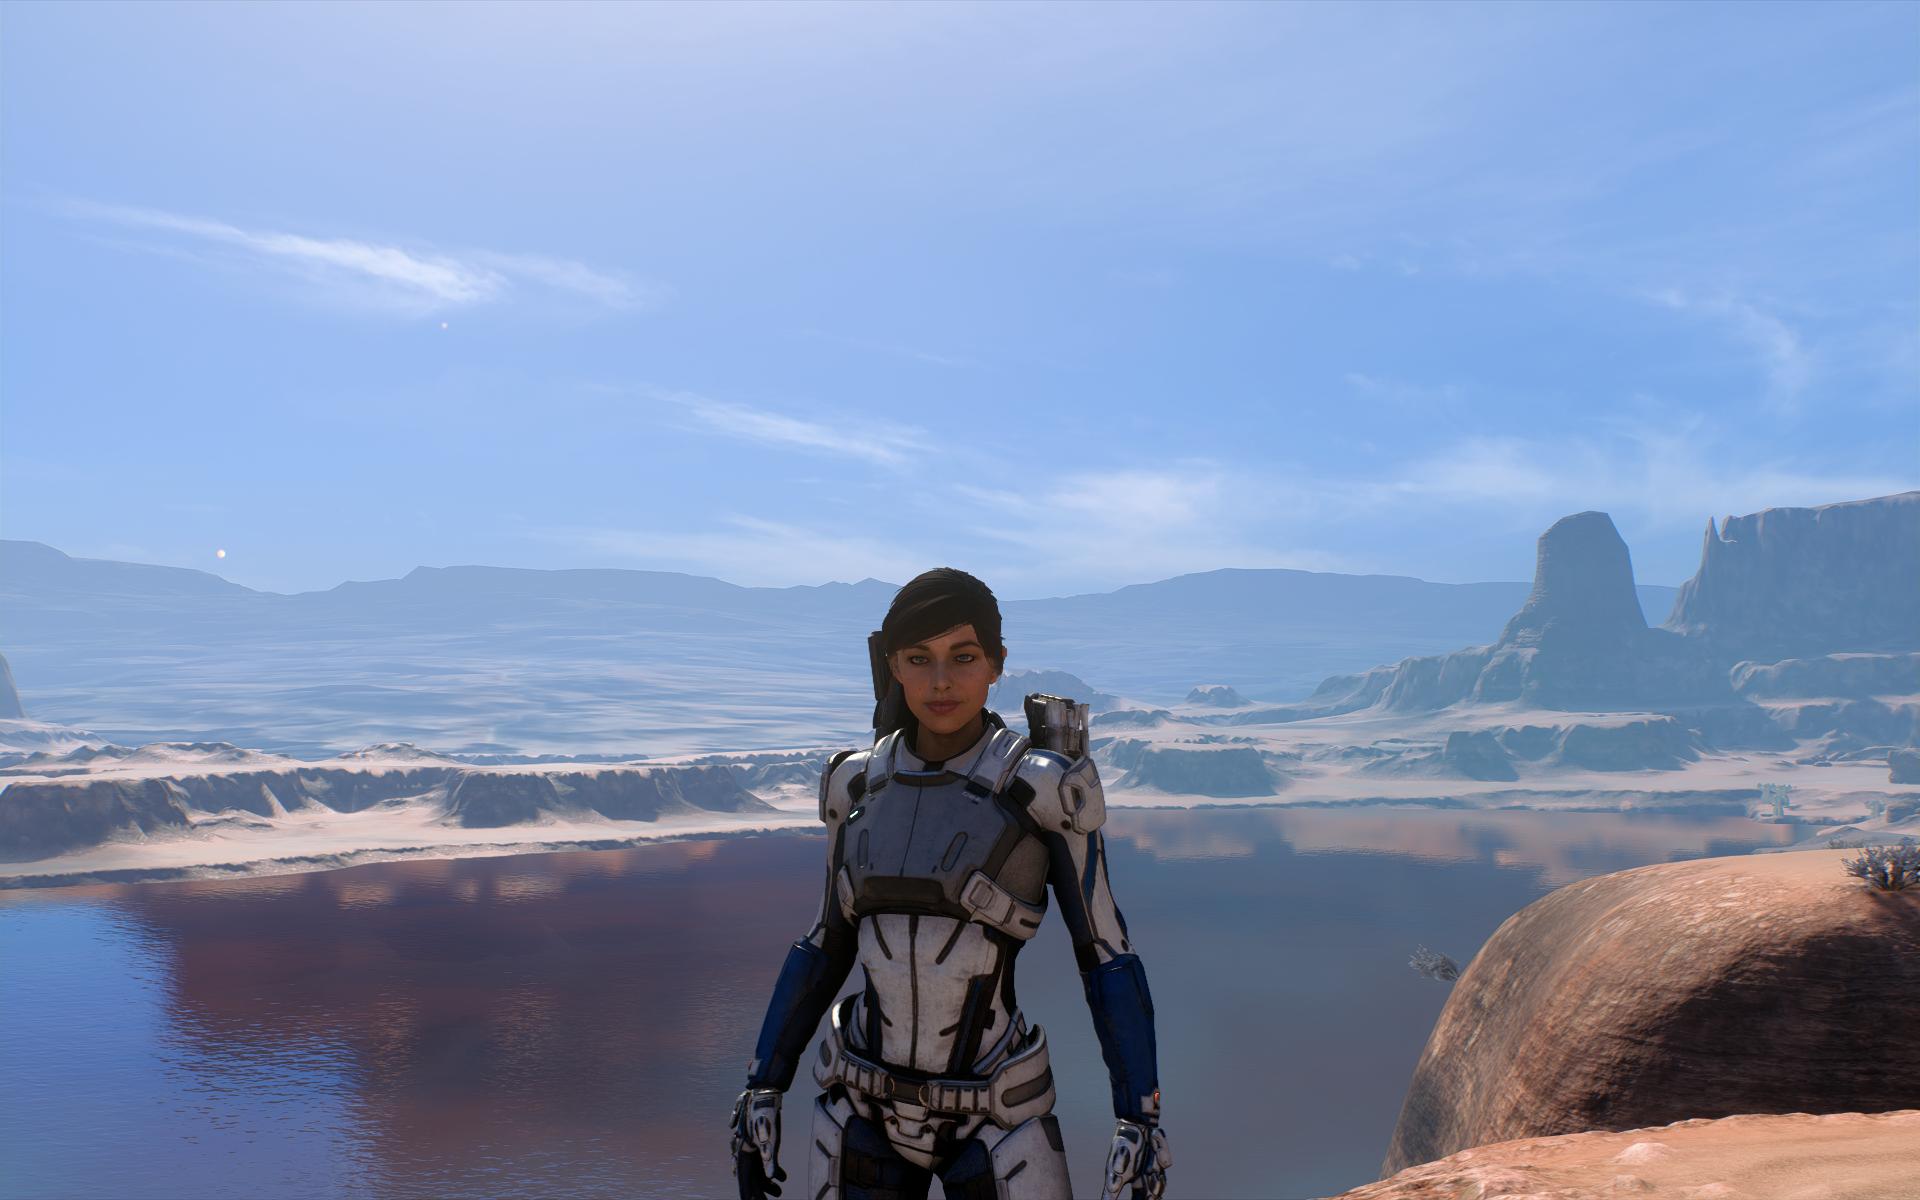 Mass Effect Andromeda Screenshot  - 06.50.41.26.png - Mass Effect: Andromeda